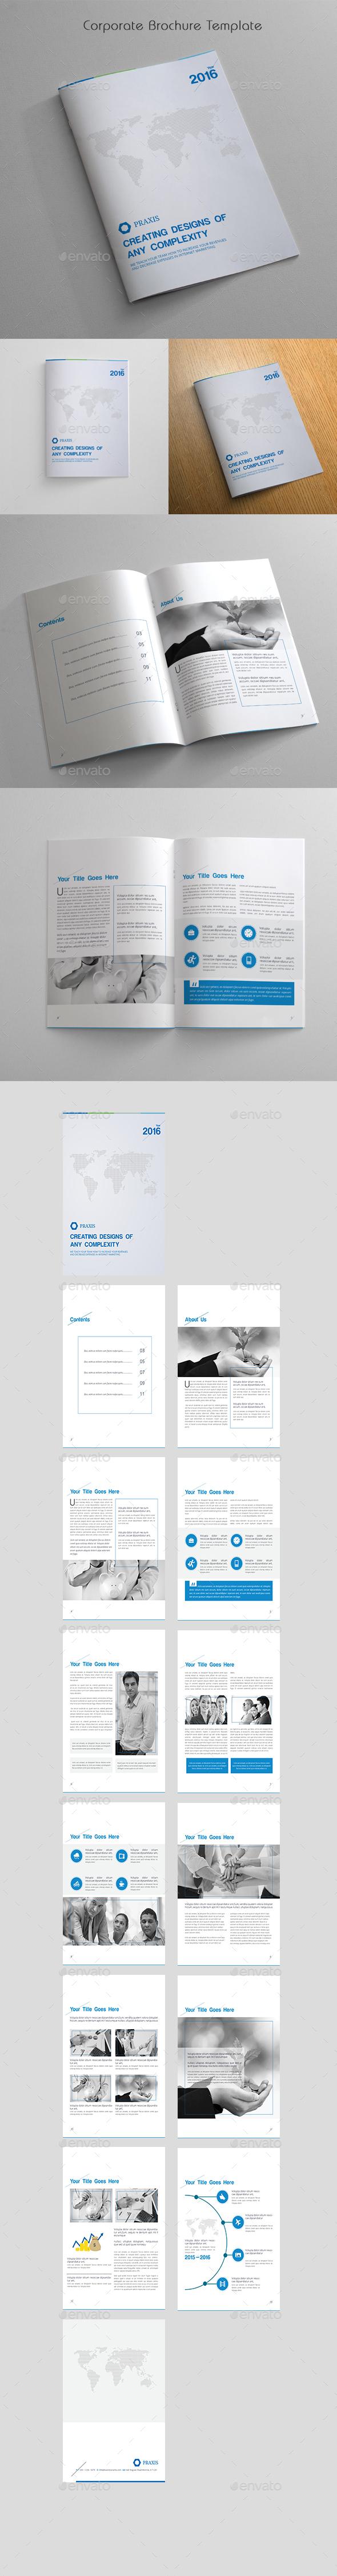 Corporate Brochure Template - Corporate Brochures